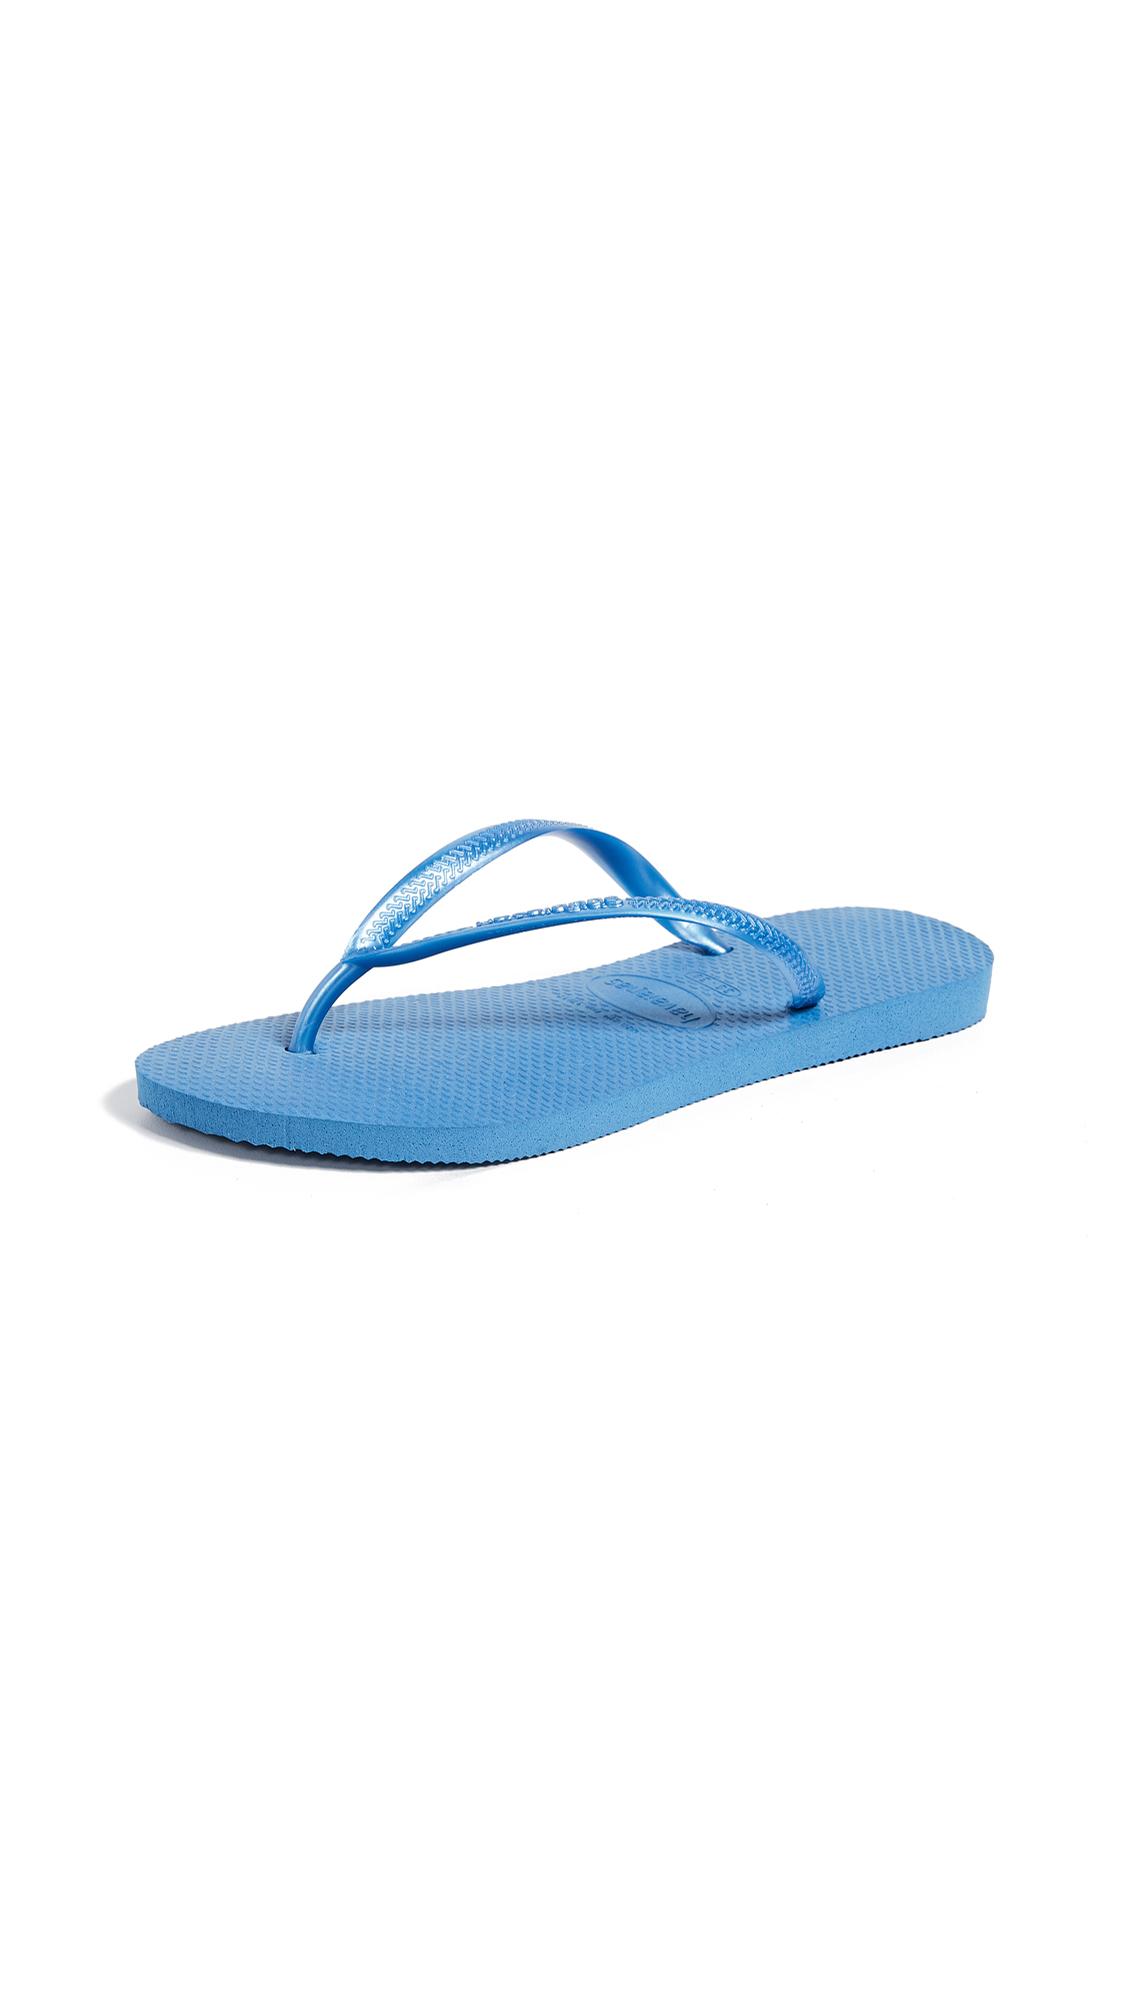 Havaianas Slim Flip Flops - Blue